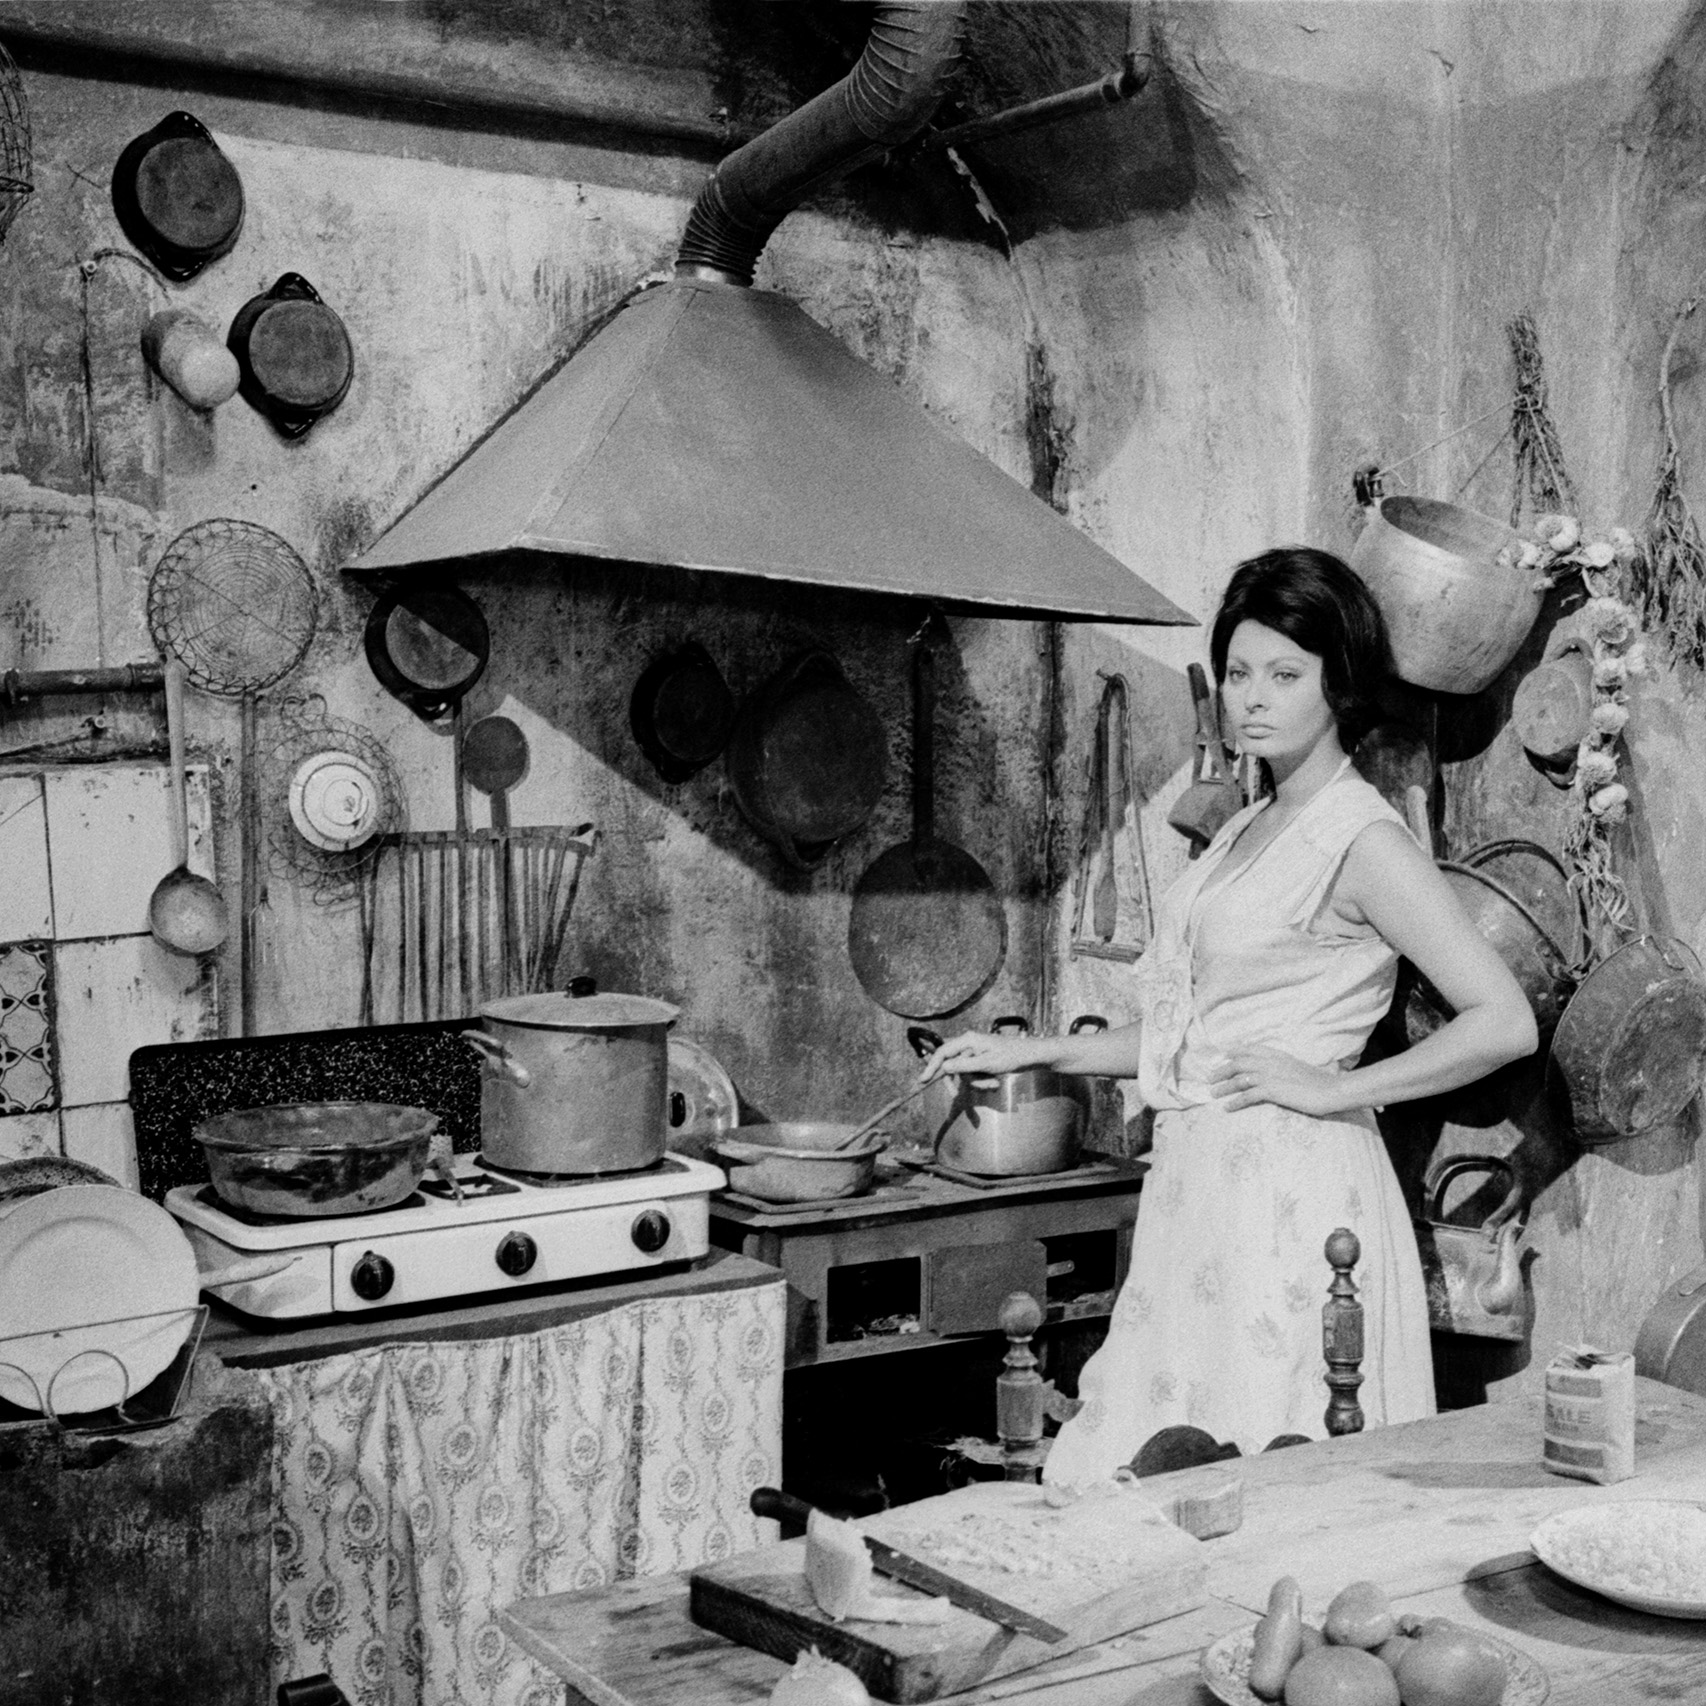 cucina con amore